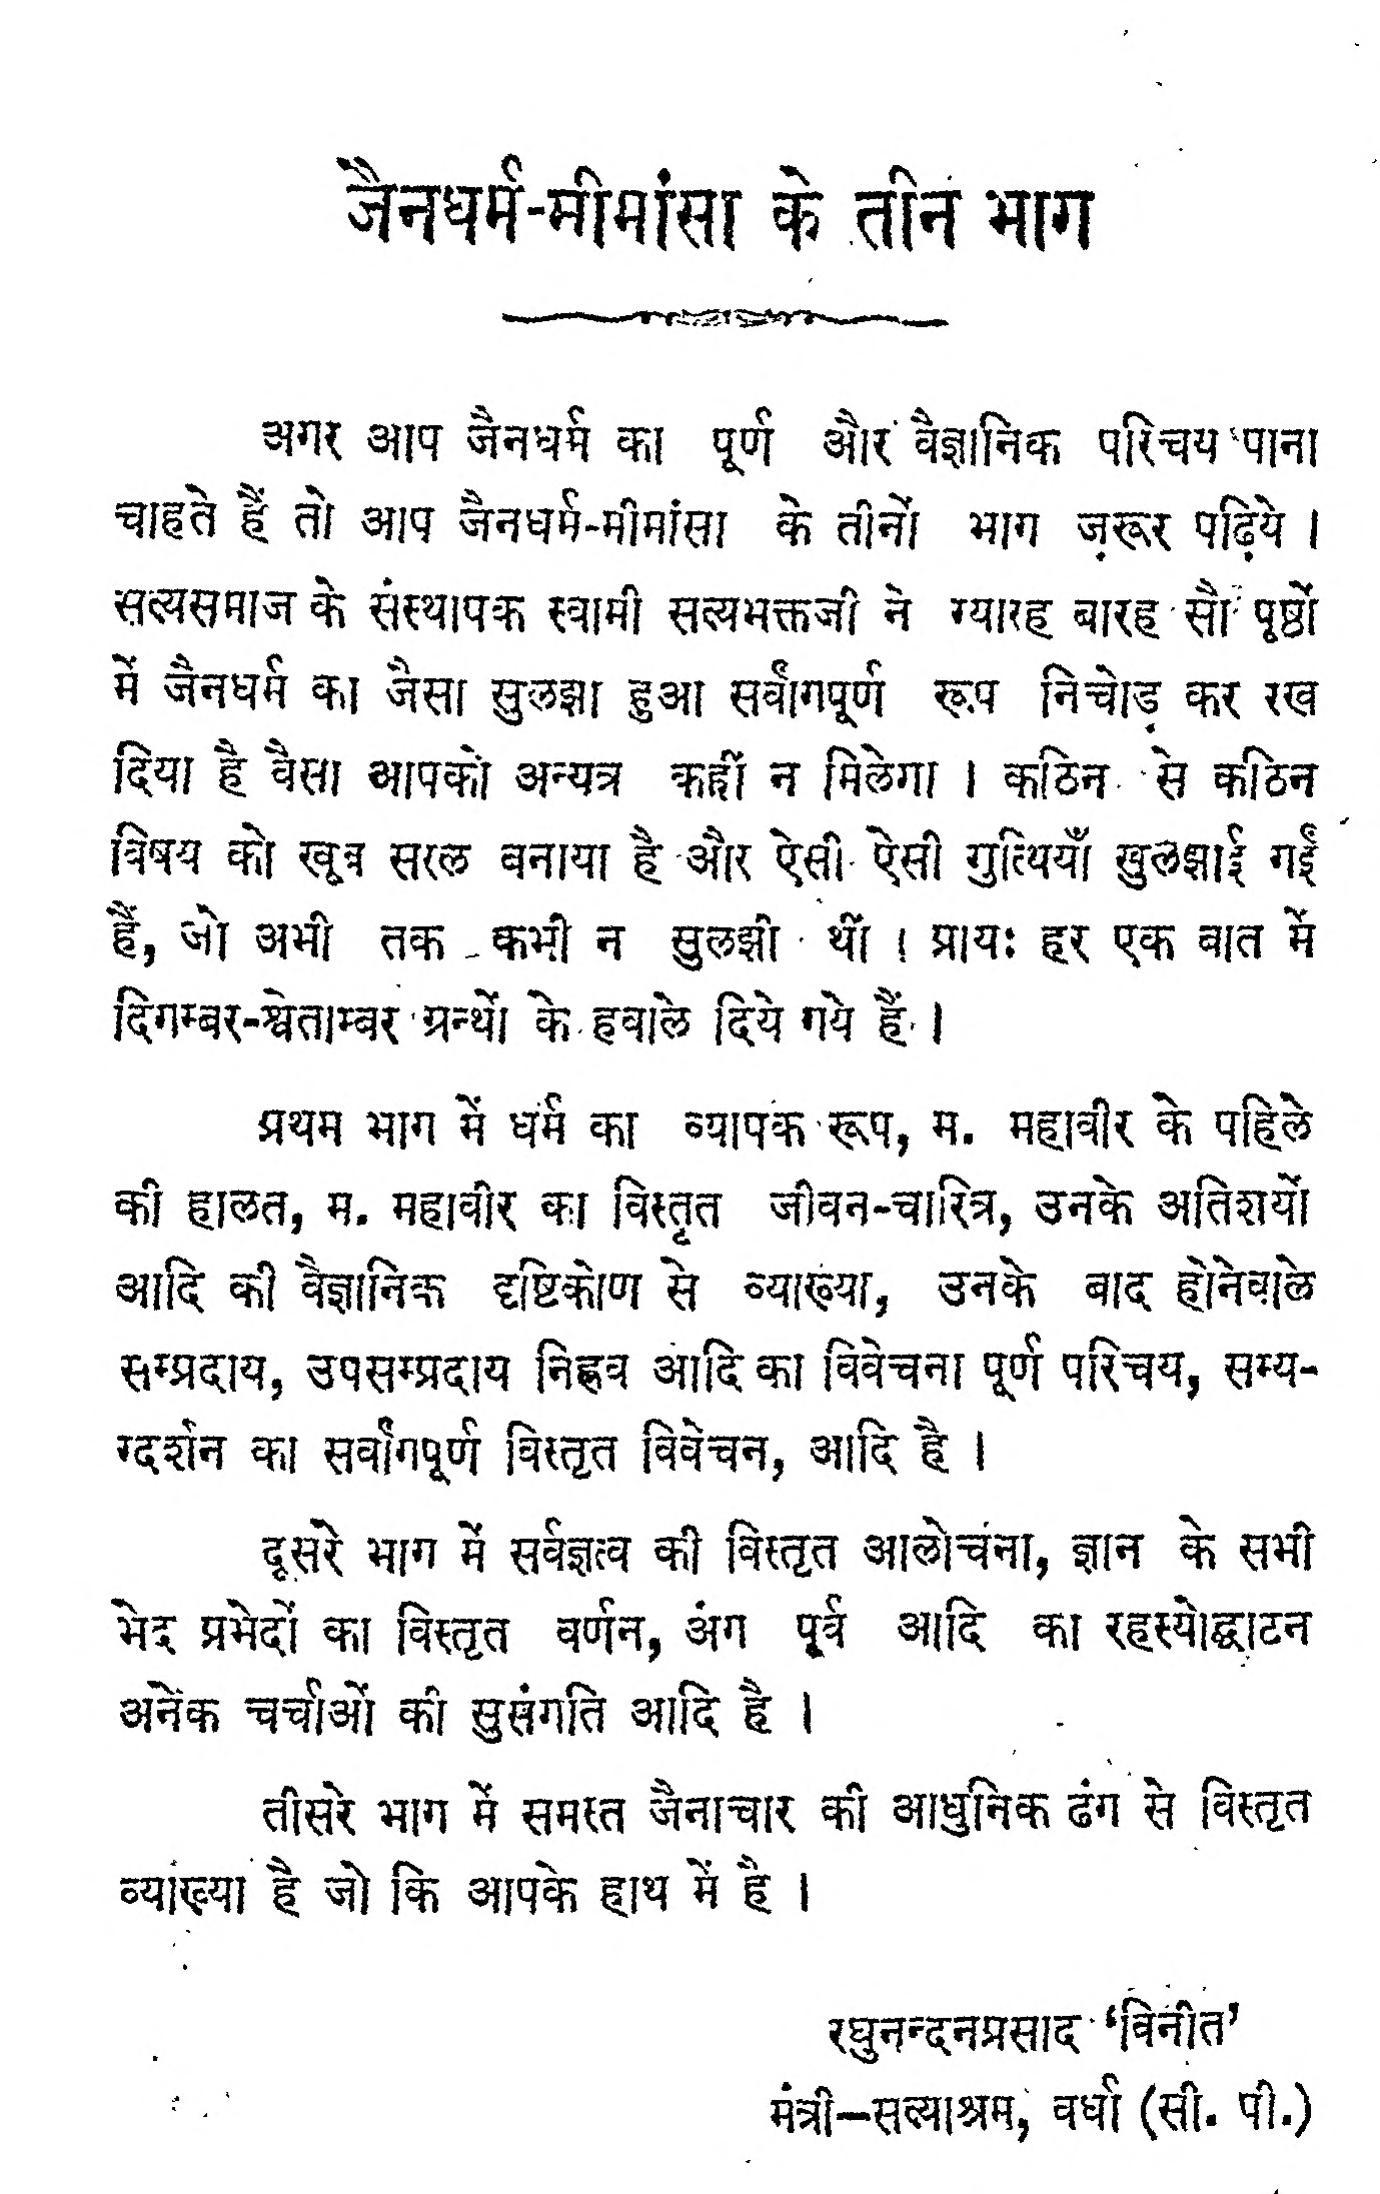 Book Image : जैन धर्म - मीमांसा भाग - 3 - Jain Dharm - Maminsa Bhag - 3